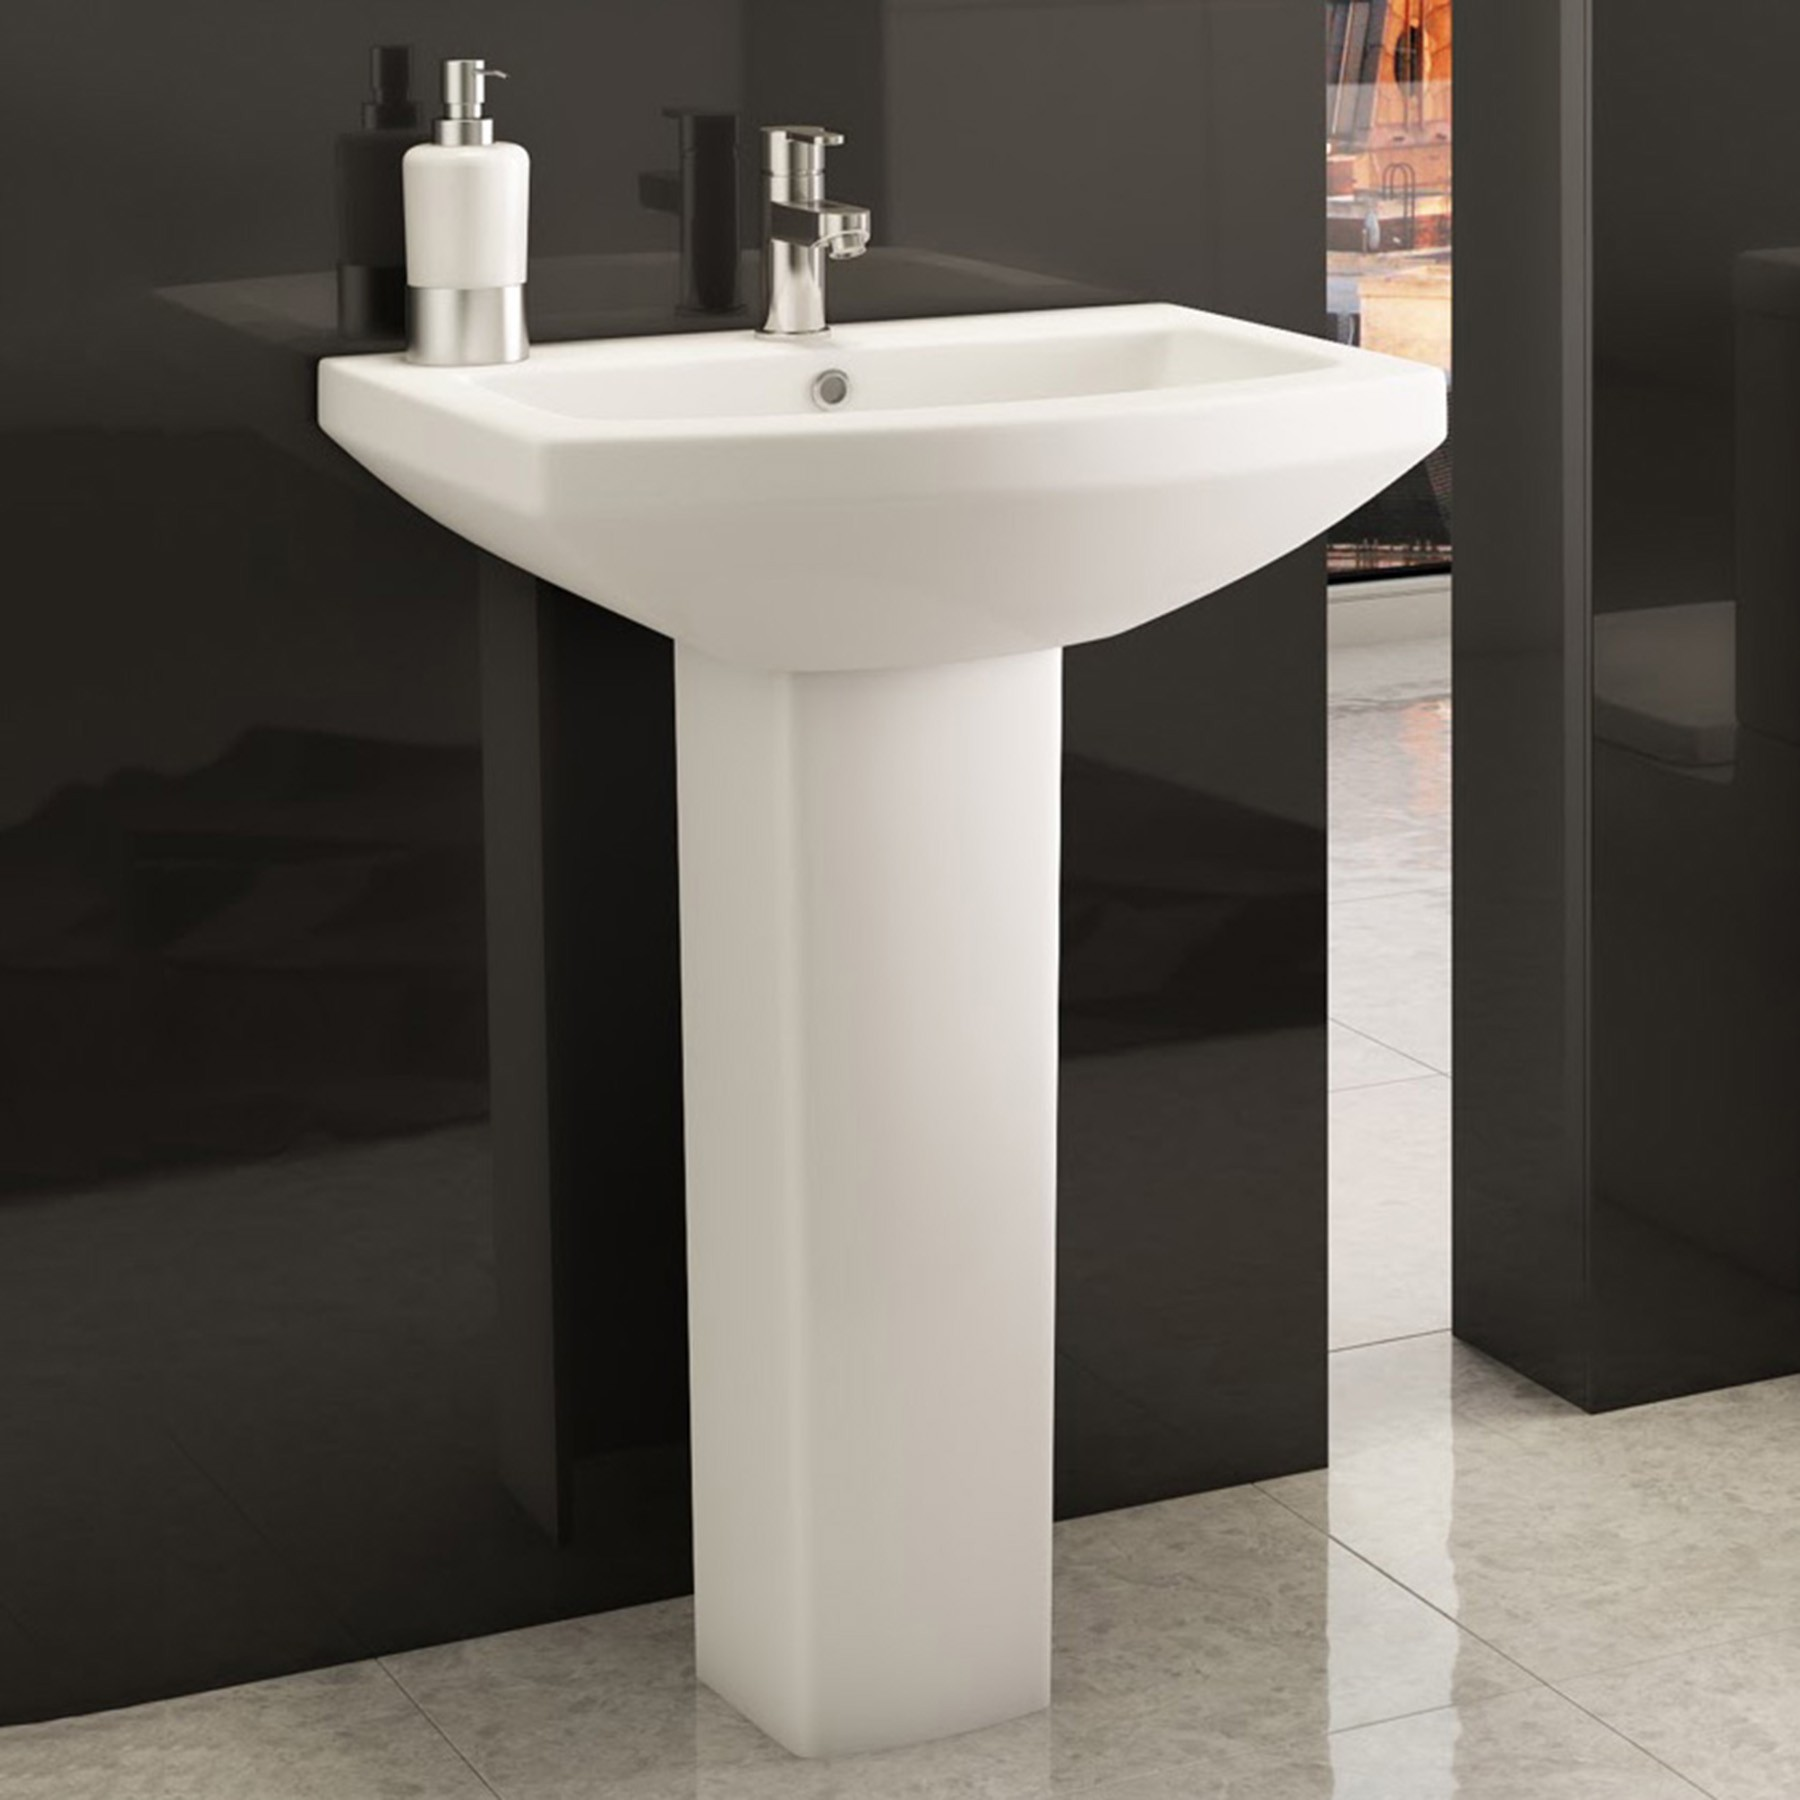 Basins With Full Pedestal